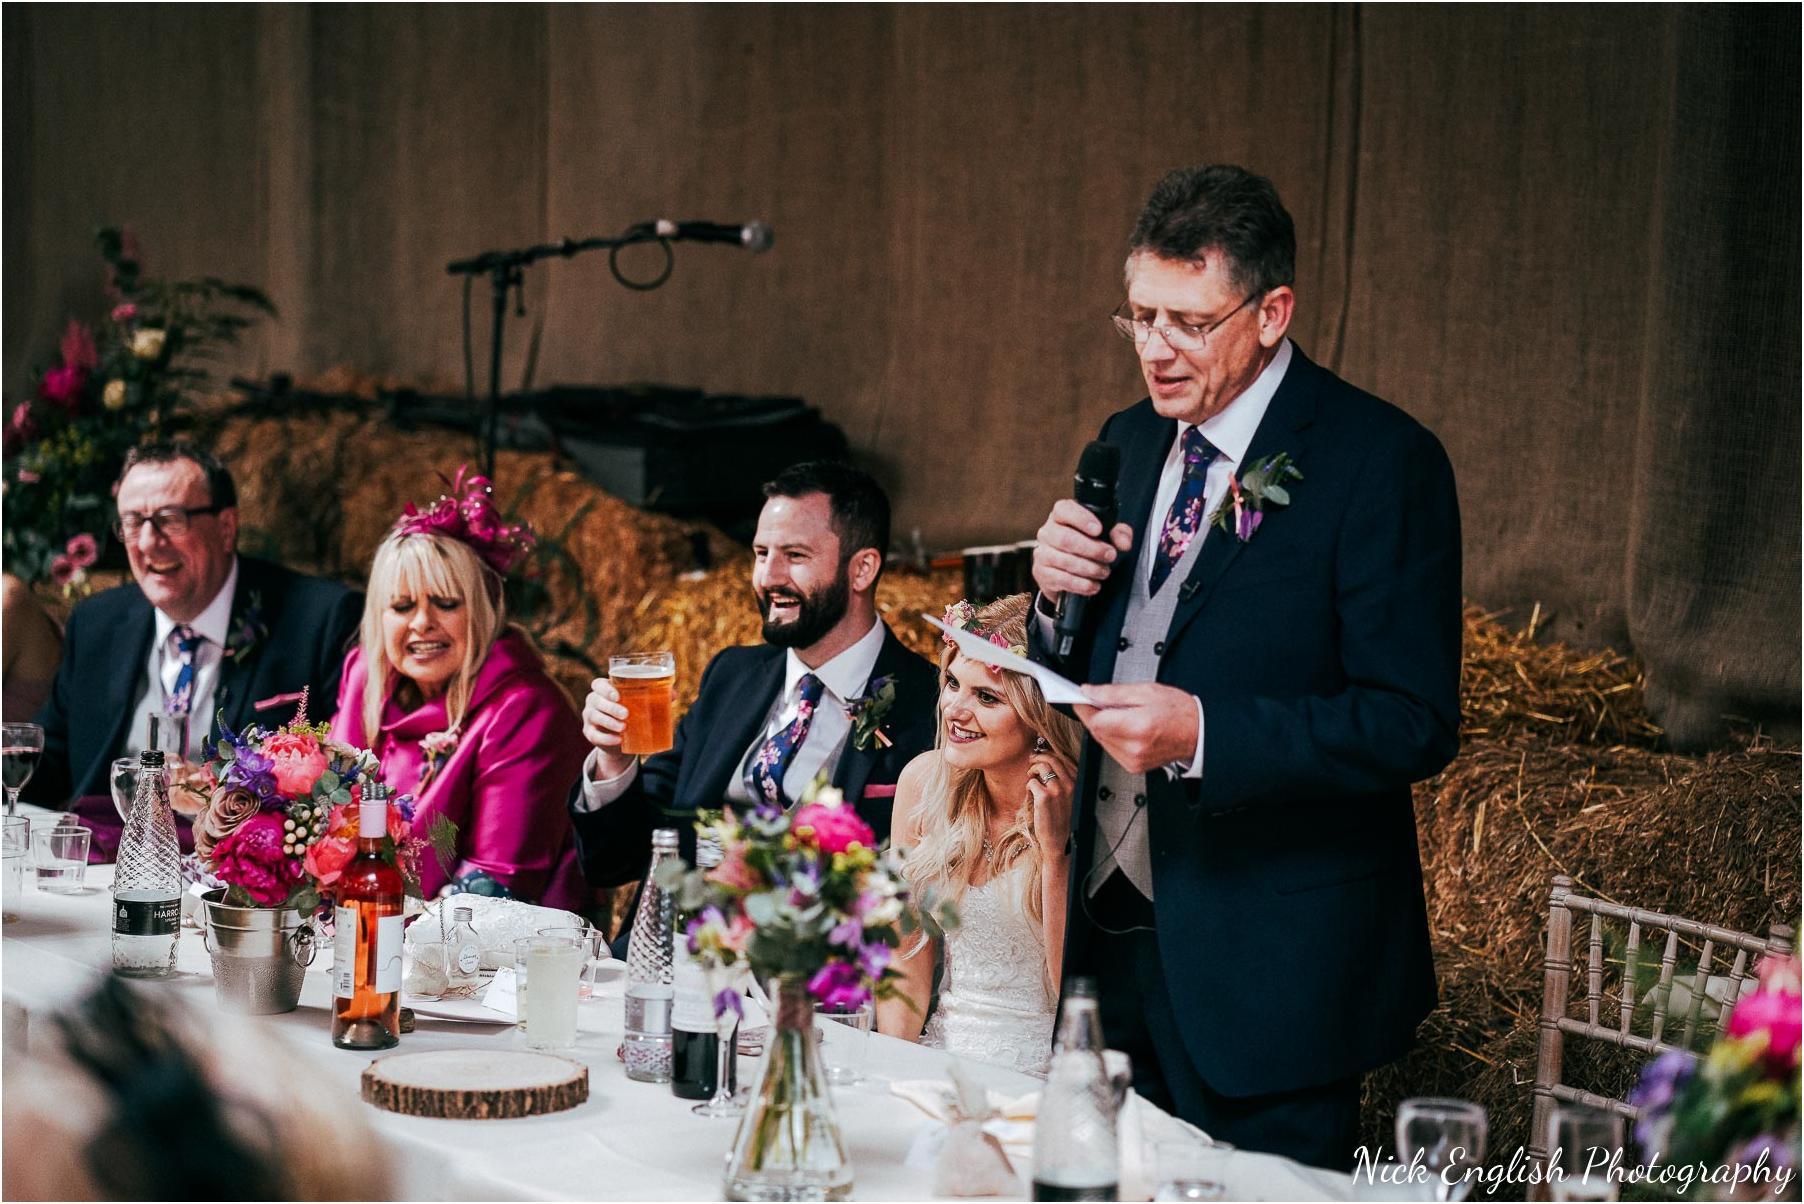 Whitebottom_Farm_Wedding_Manchester_Photograph-71.jpg